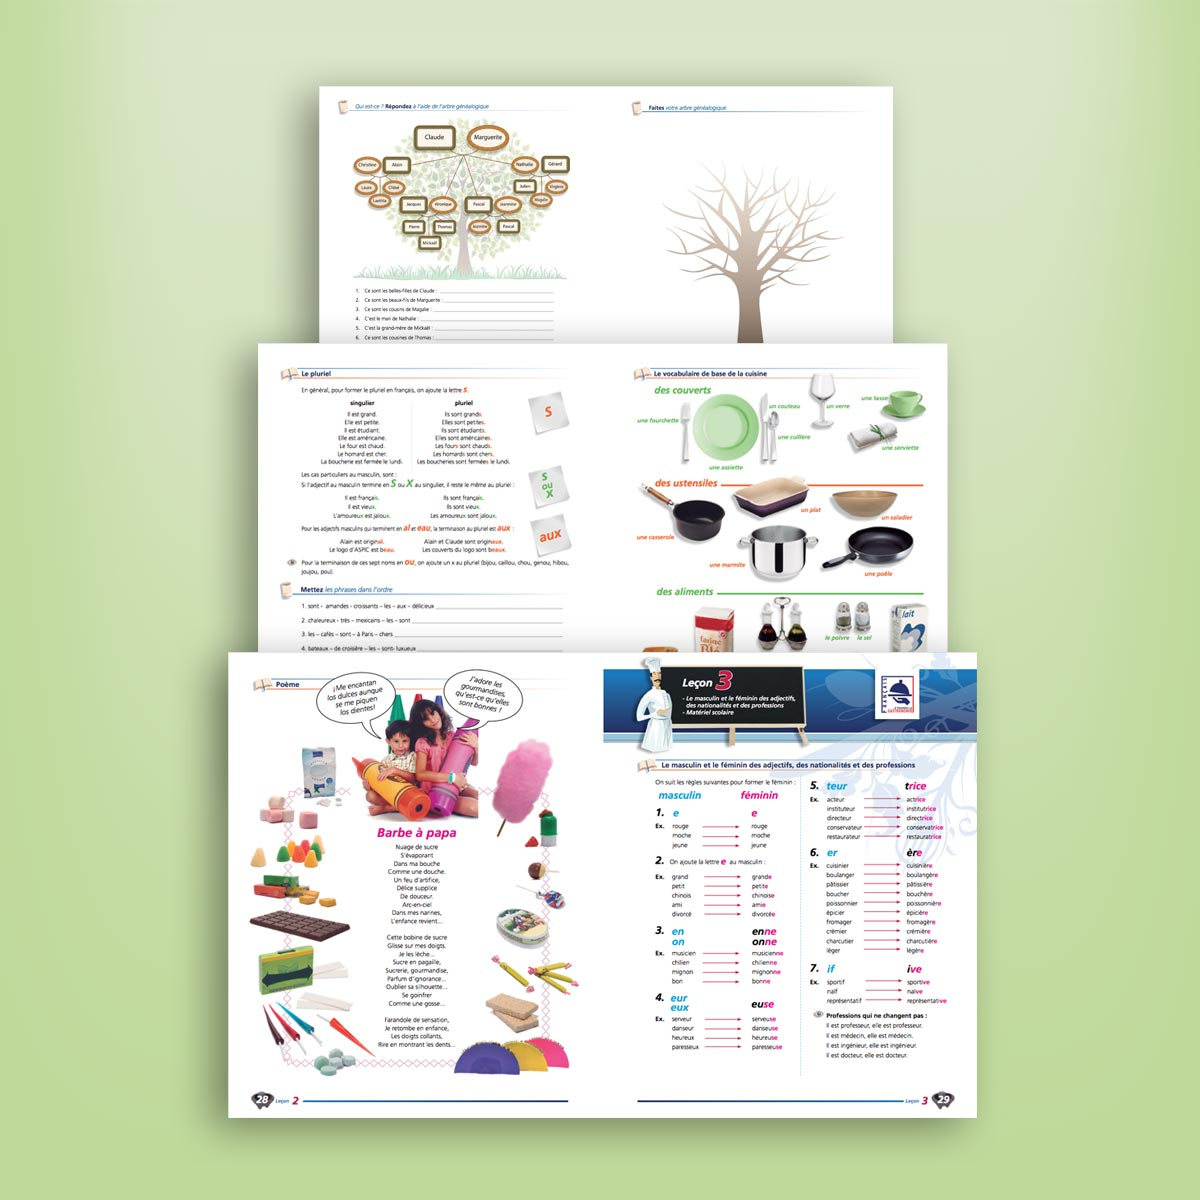 diseño gráfico e ilustración